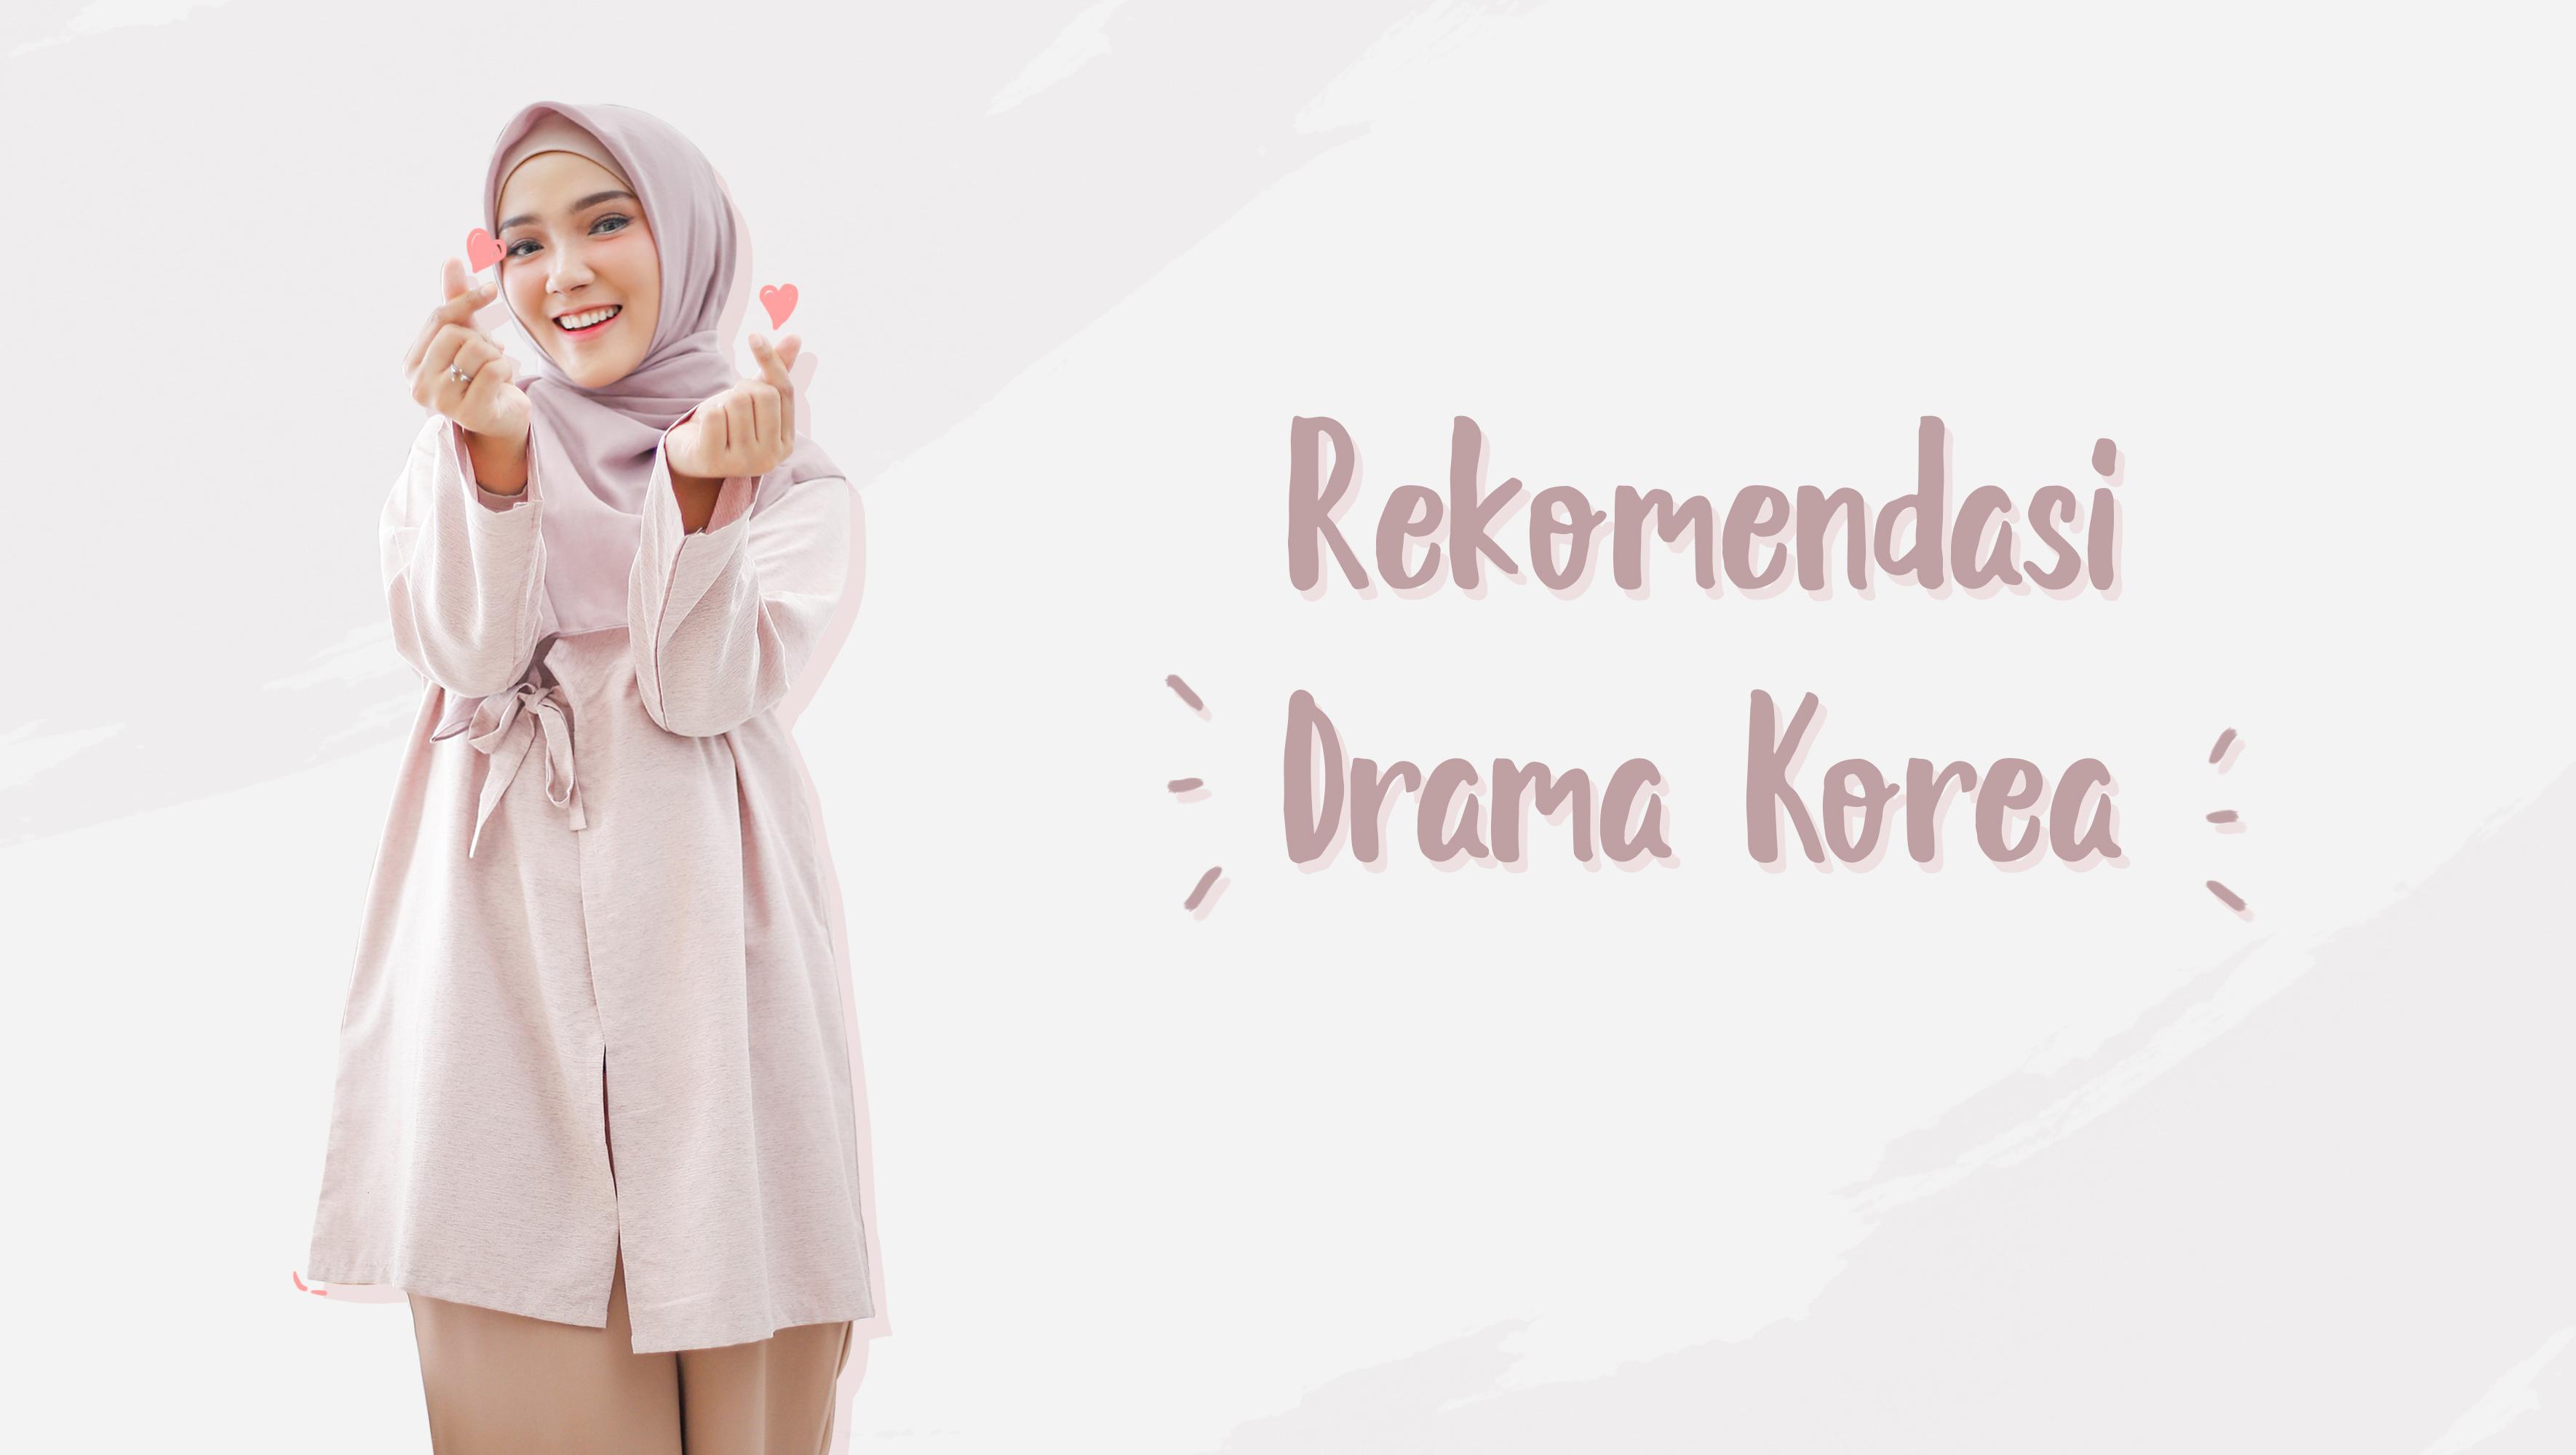 Rekomendasi Drama Korea image